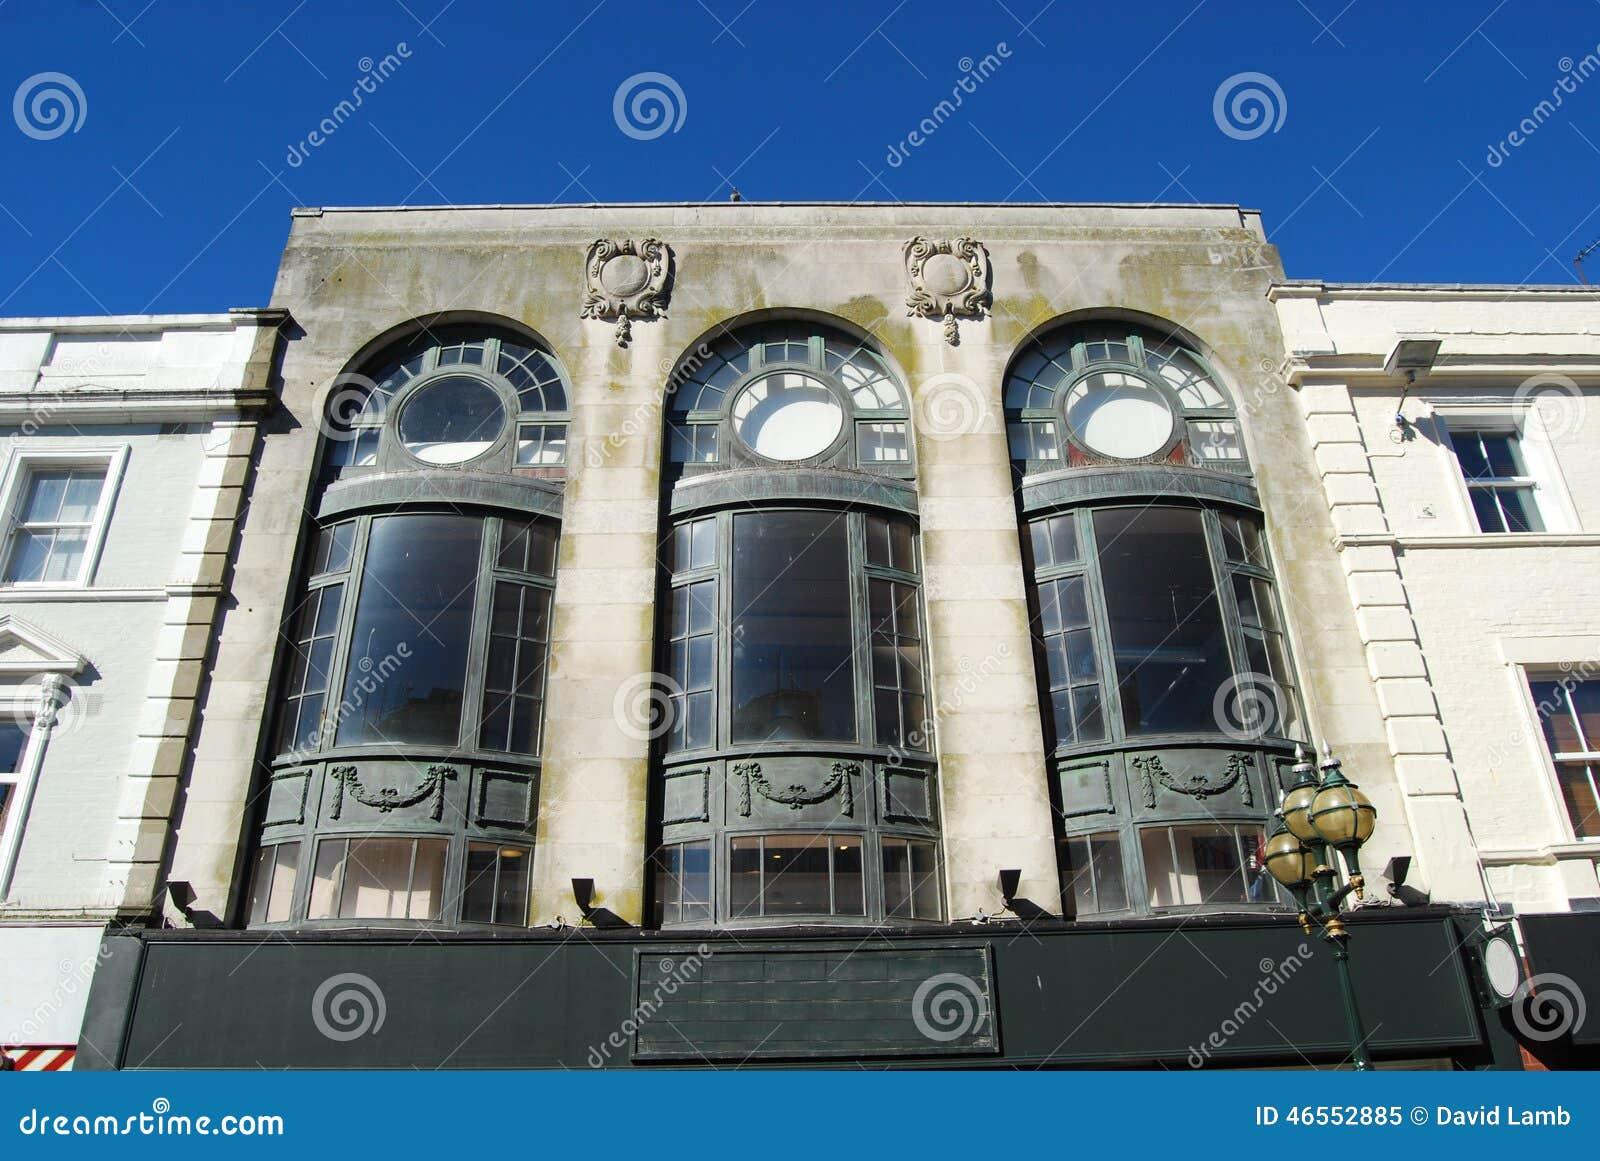 Art deco facade stock image image of period deco for Art deco online shop